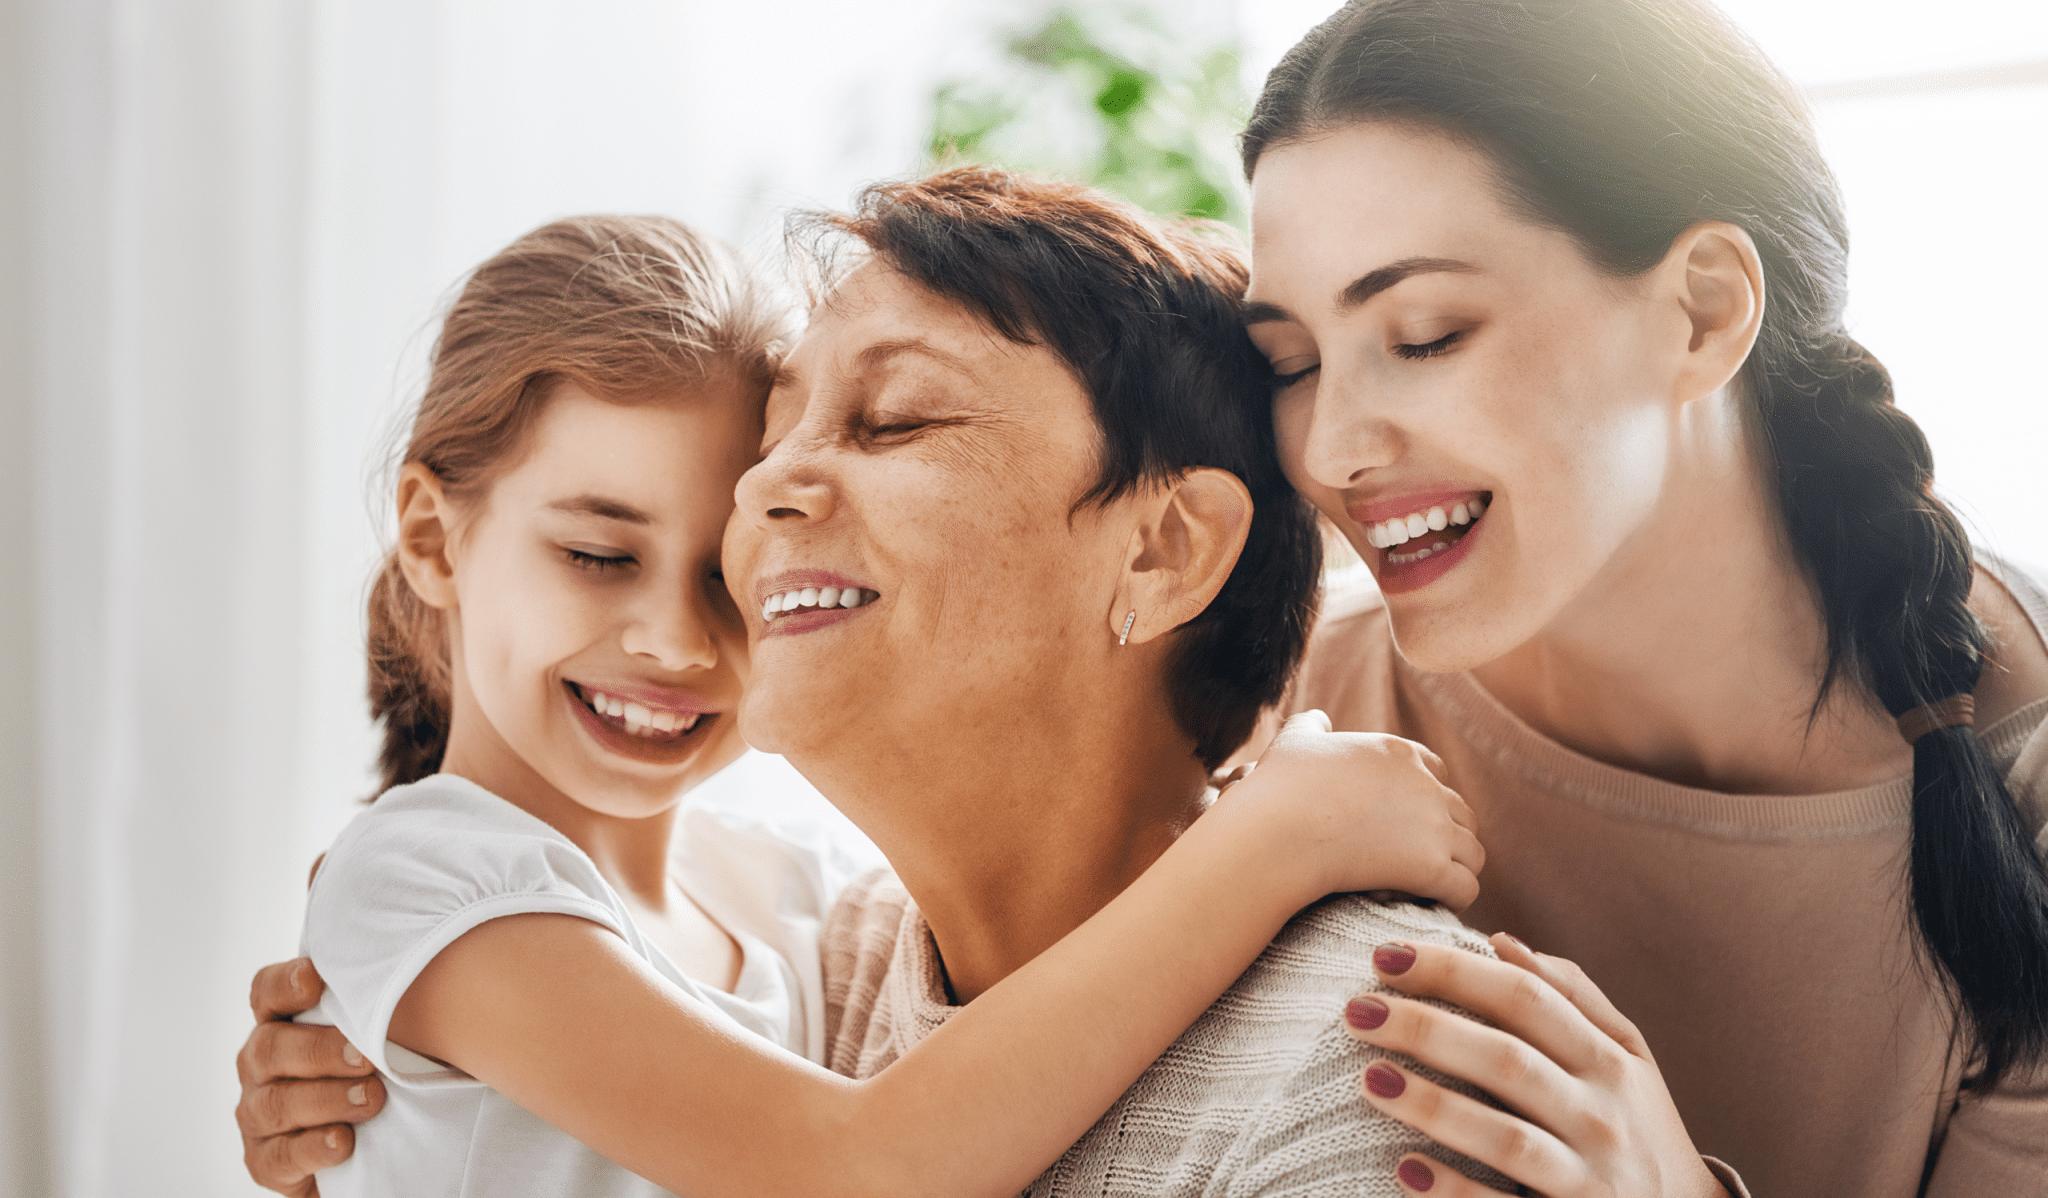 Three generations of women hugging